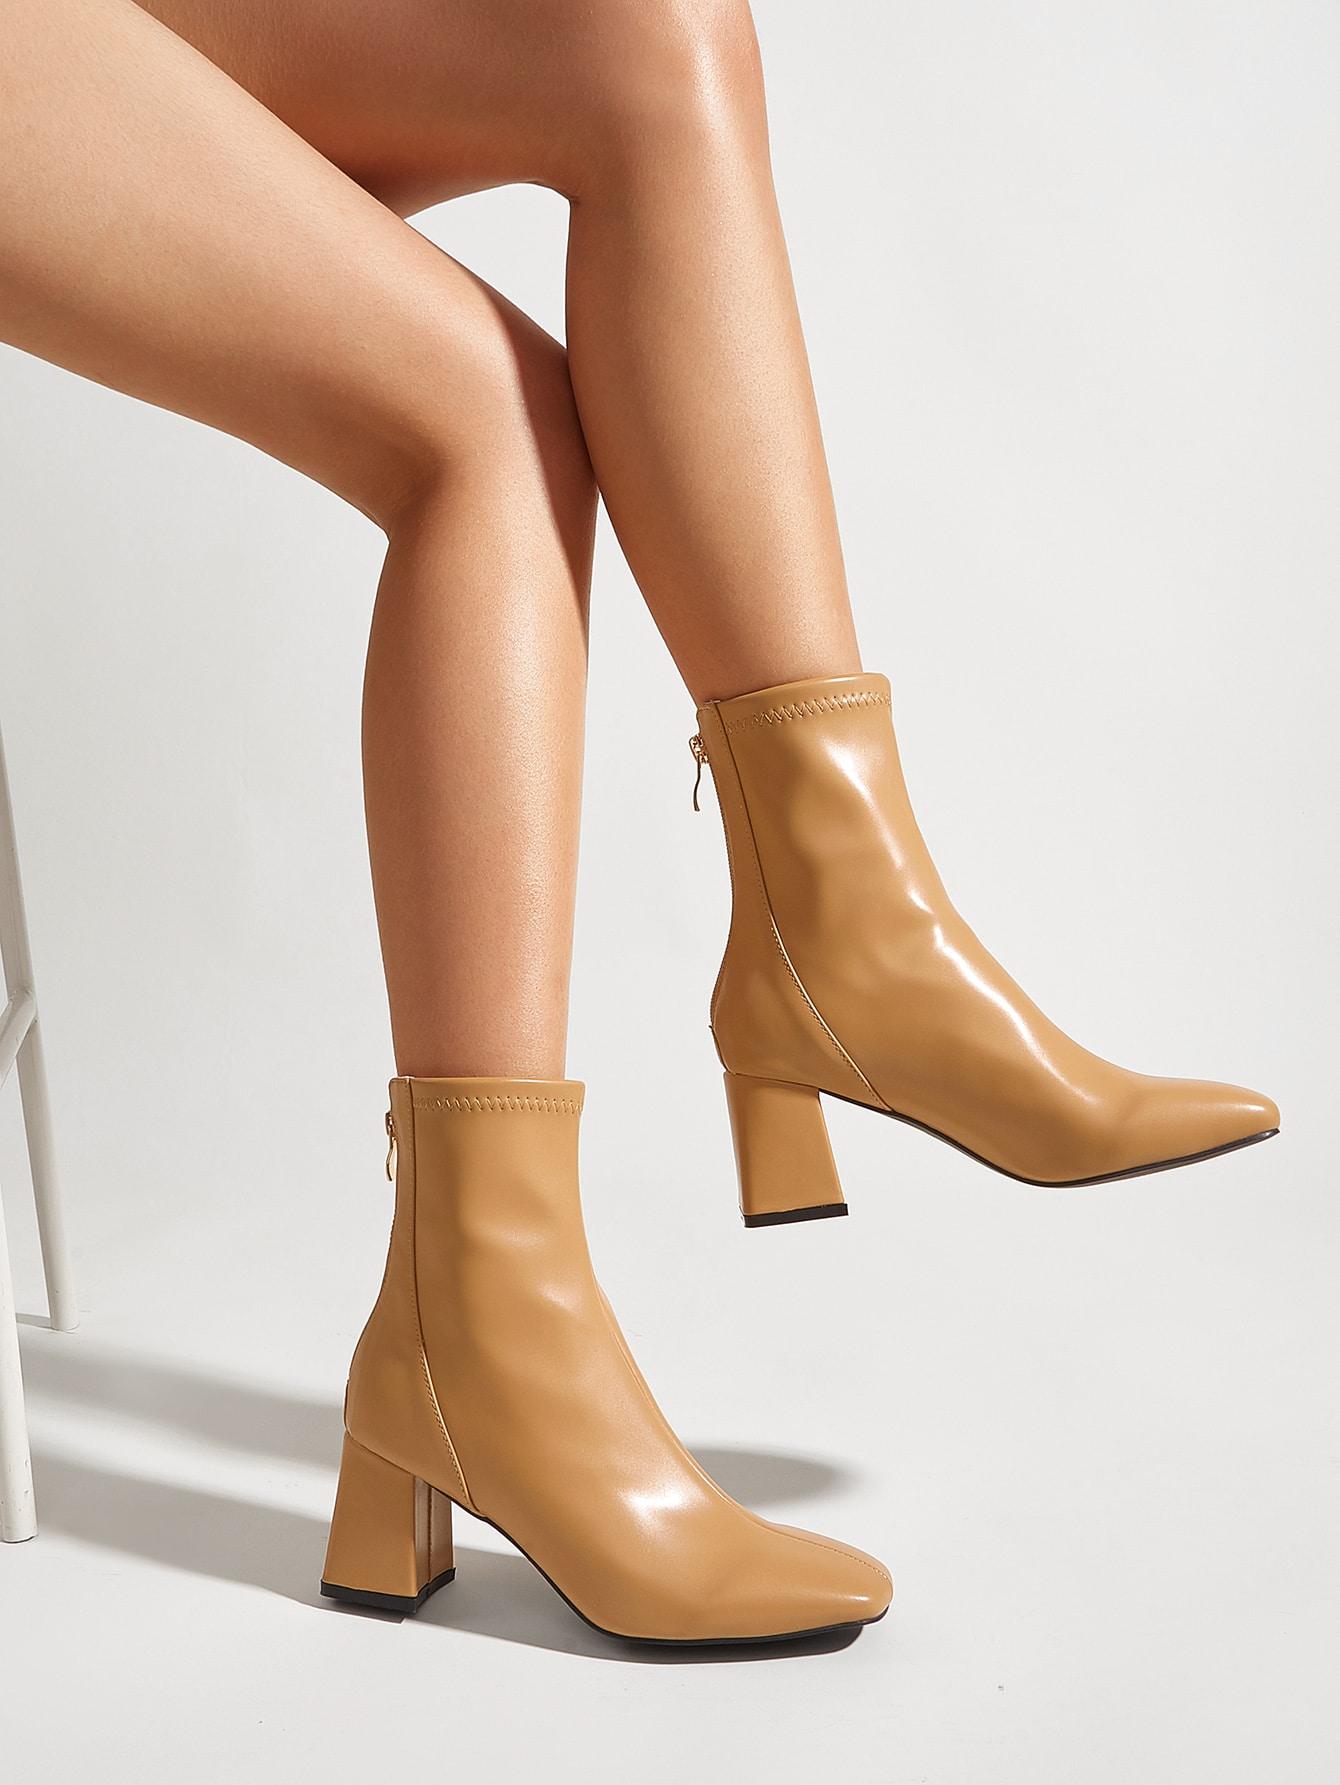 Minimalist Chunky Heeled Boots